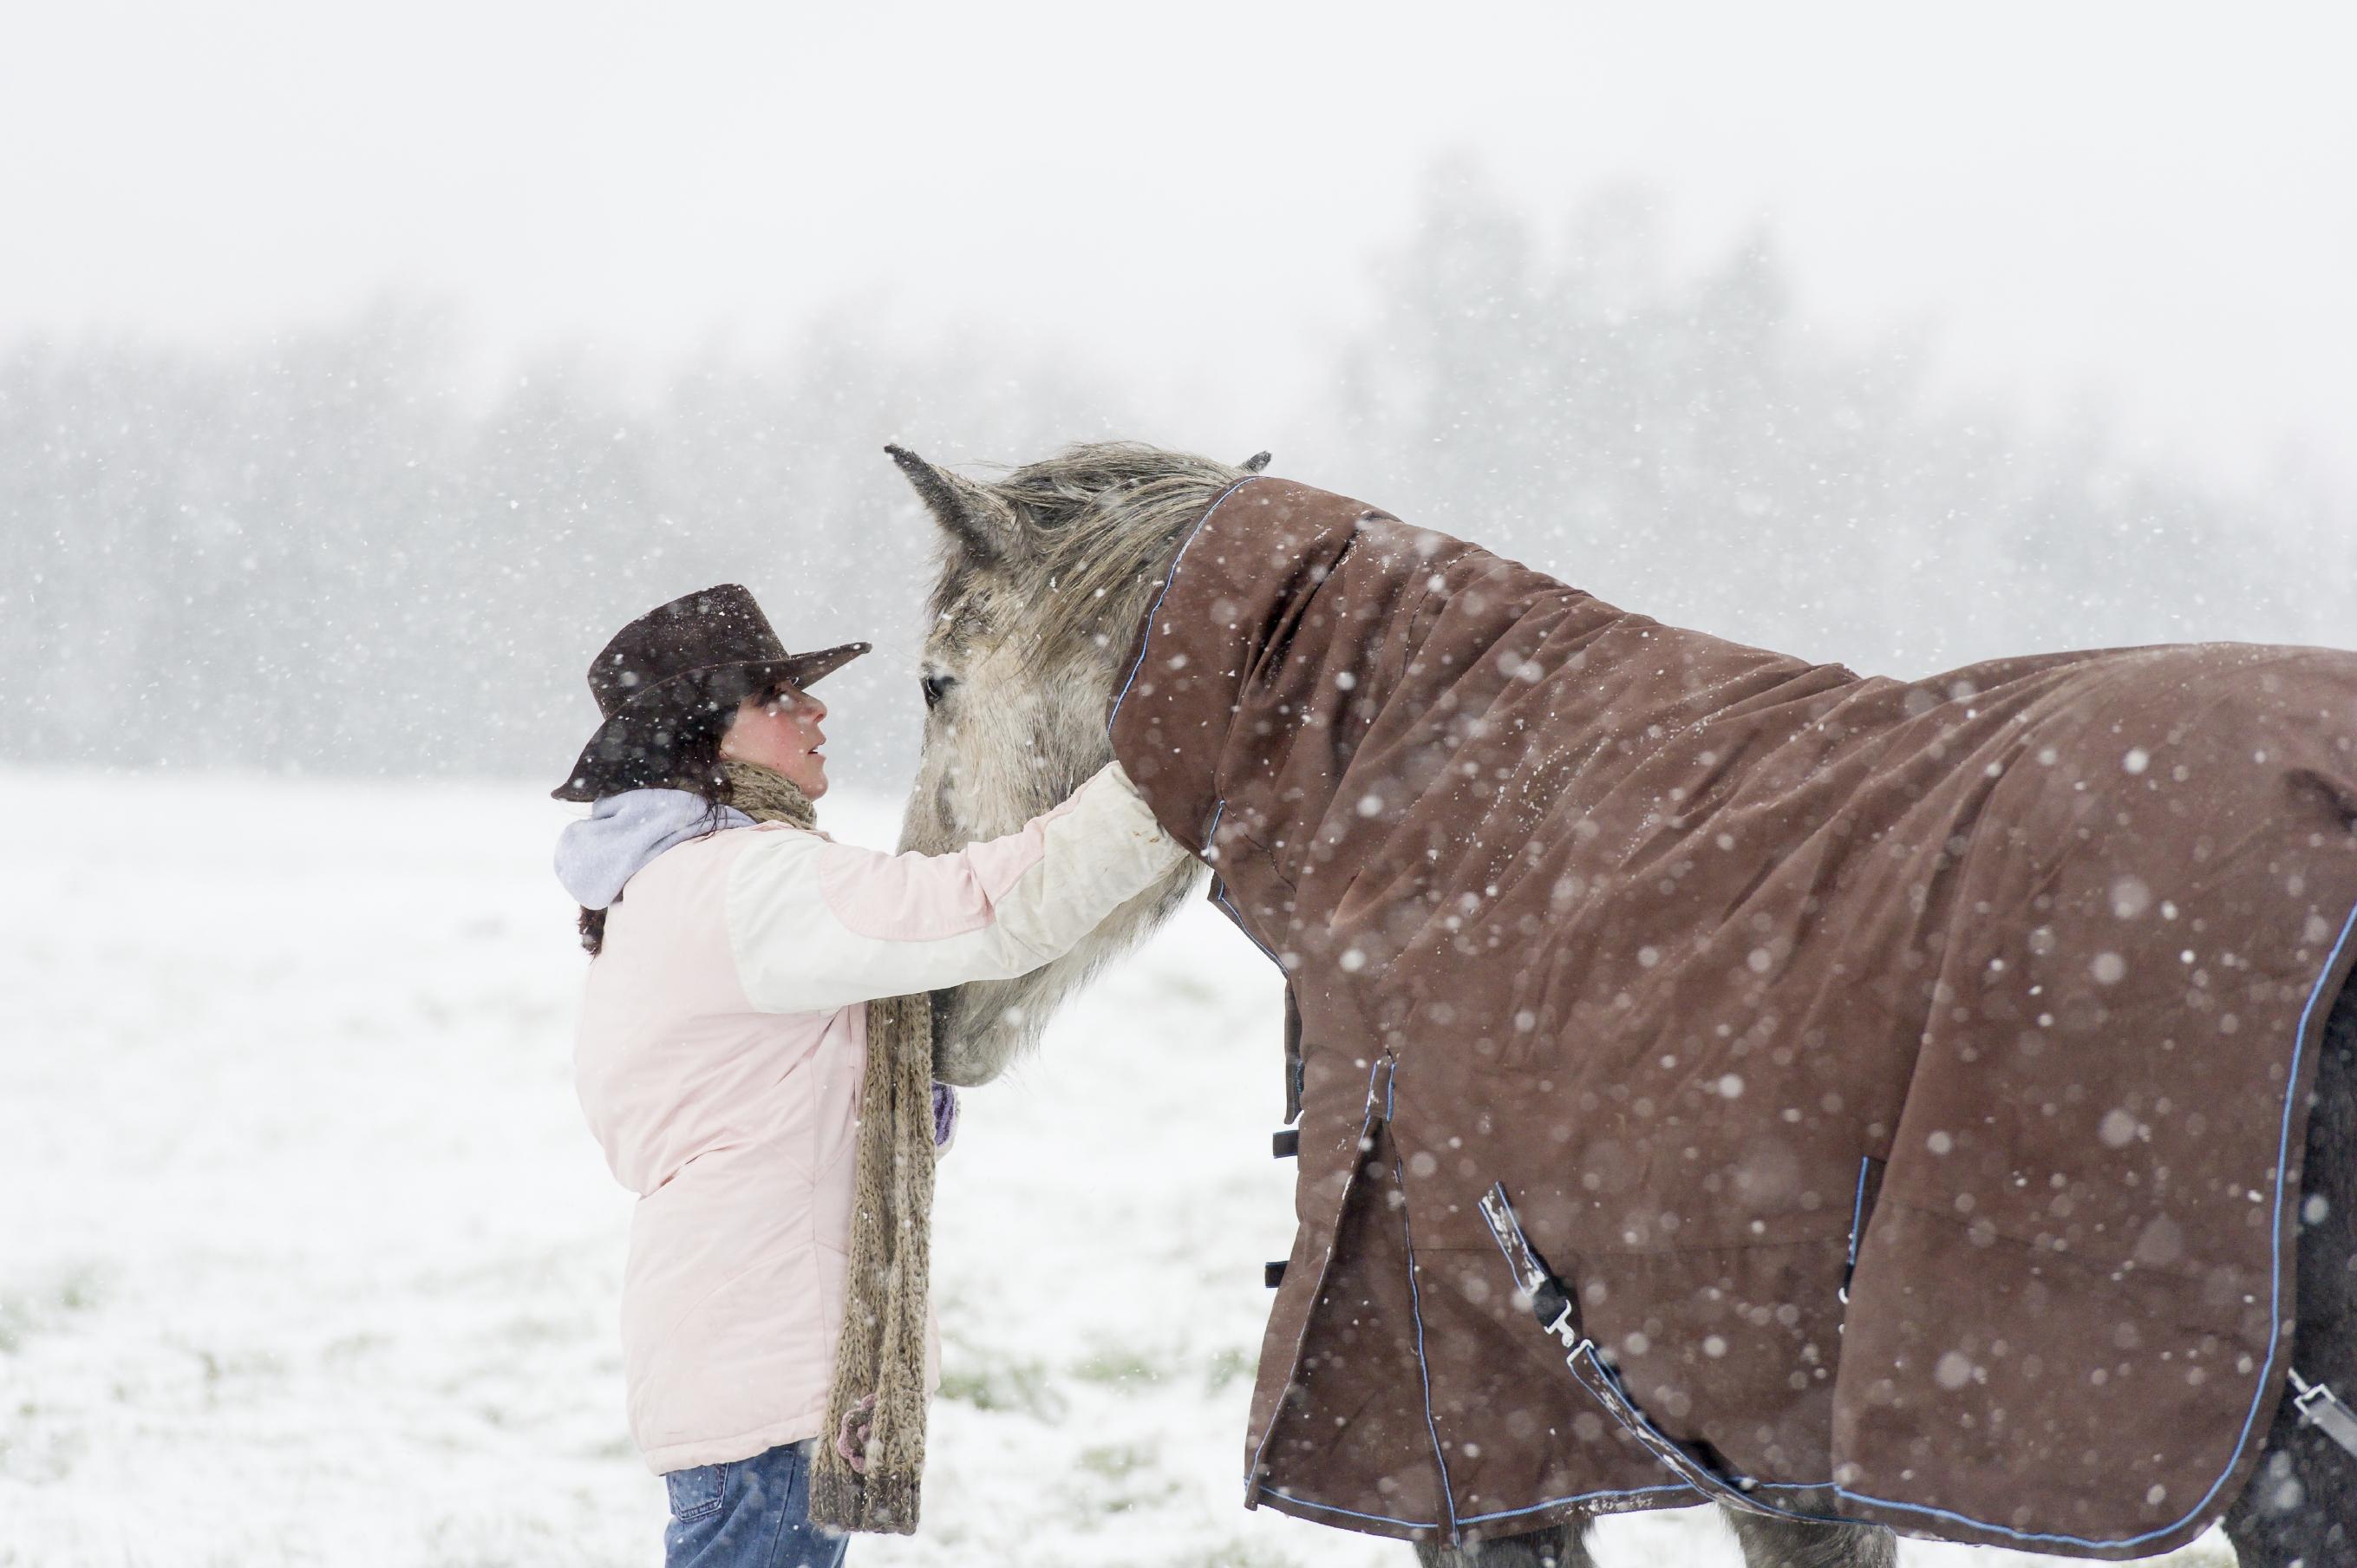 horsebox insurance christmas gifts for your horse horsebox